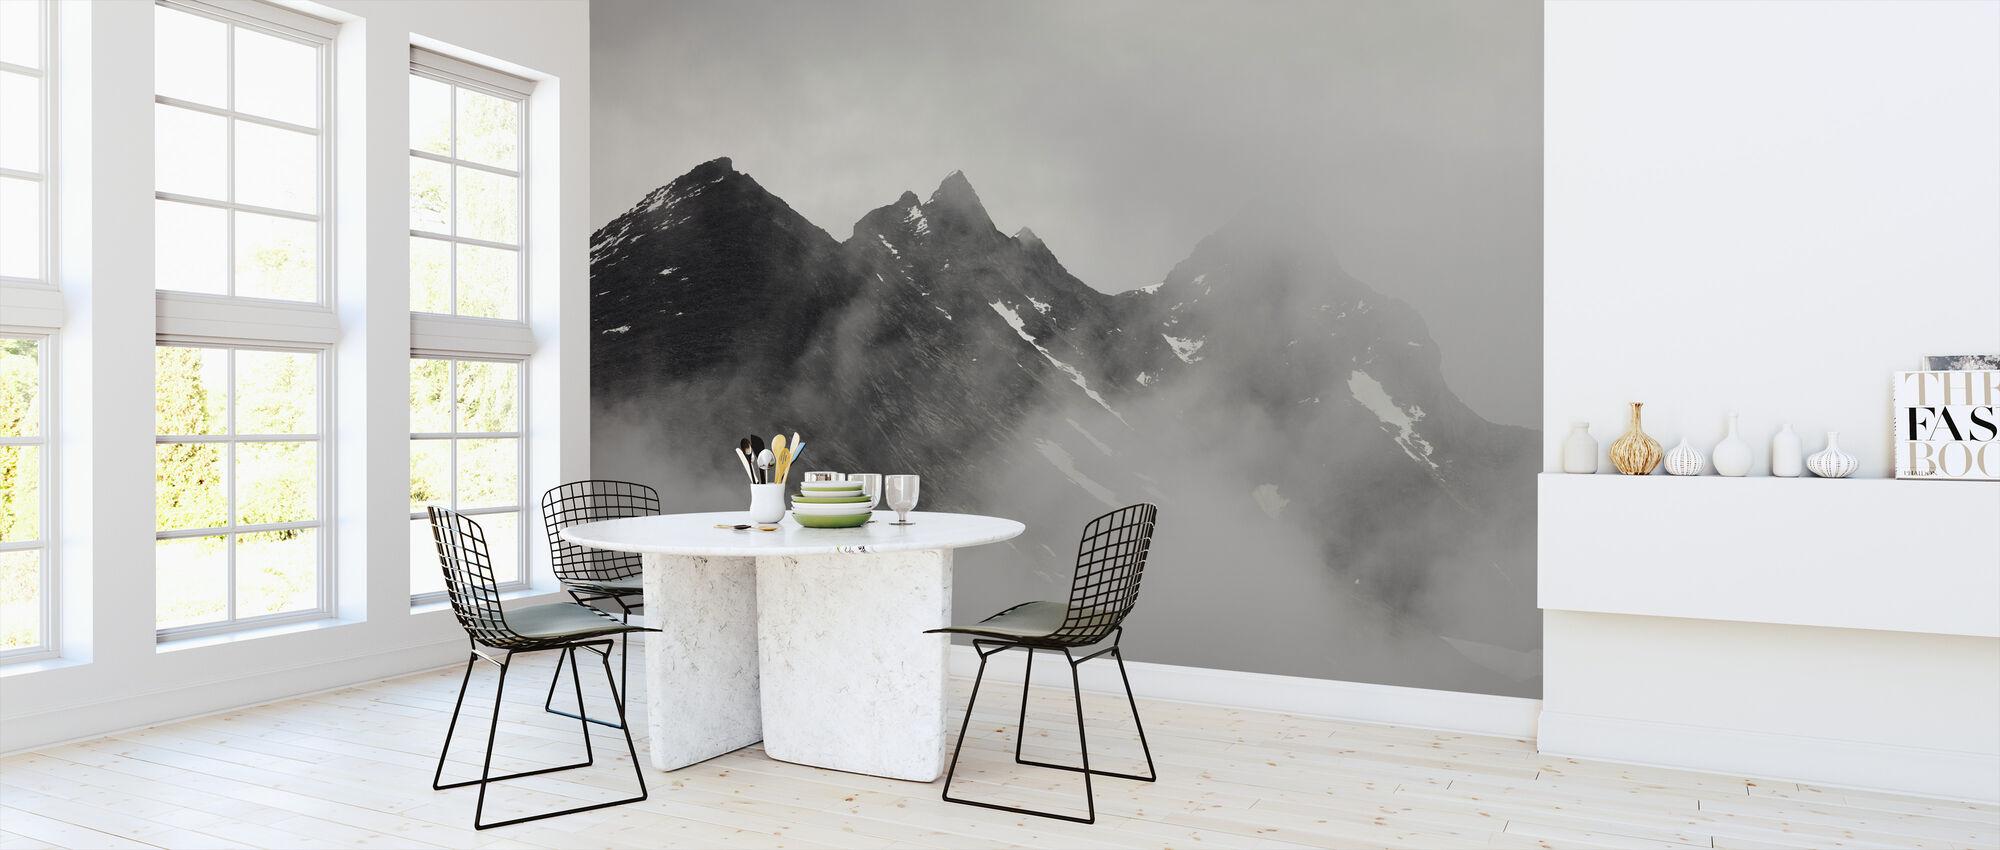 Dramatic Mountain View - Wallpaper - Kitchen